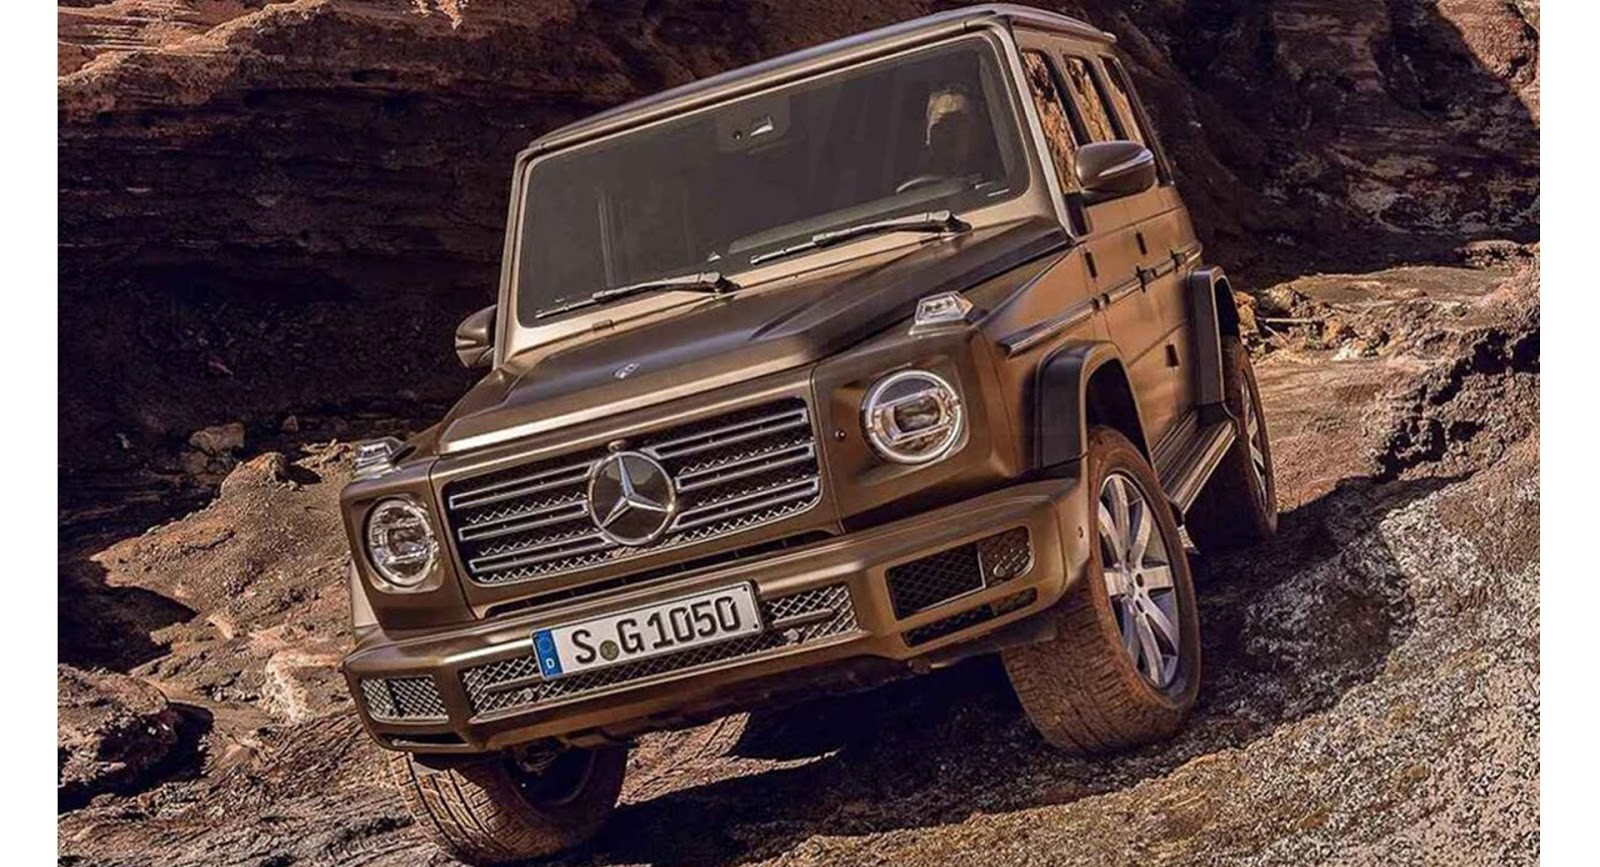 Mercedes-Benz Clase G 2018, imágenes filtradas